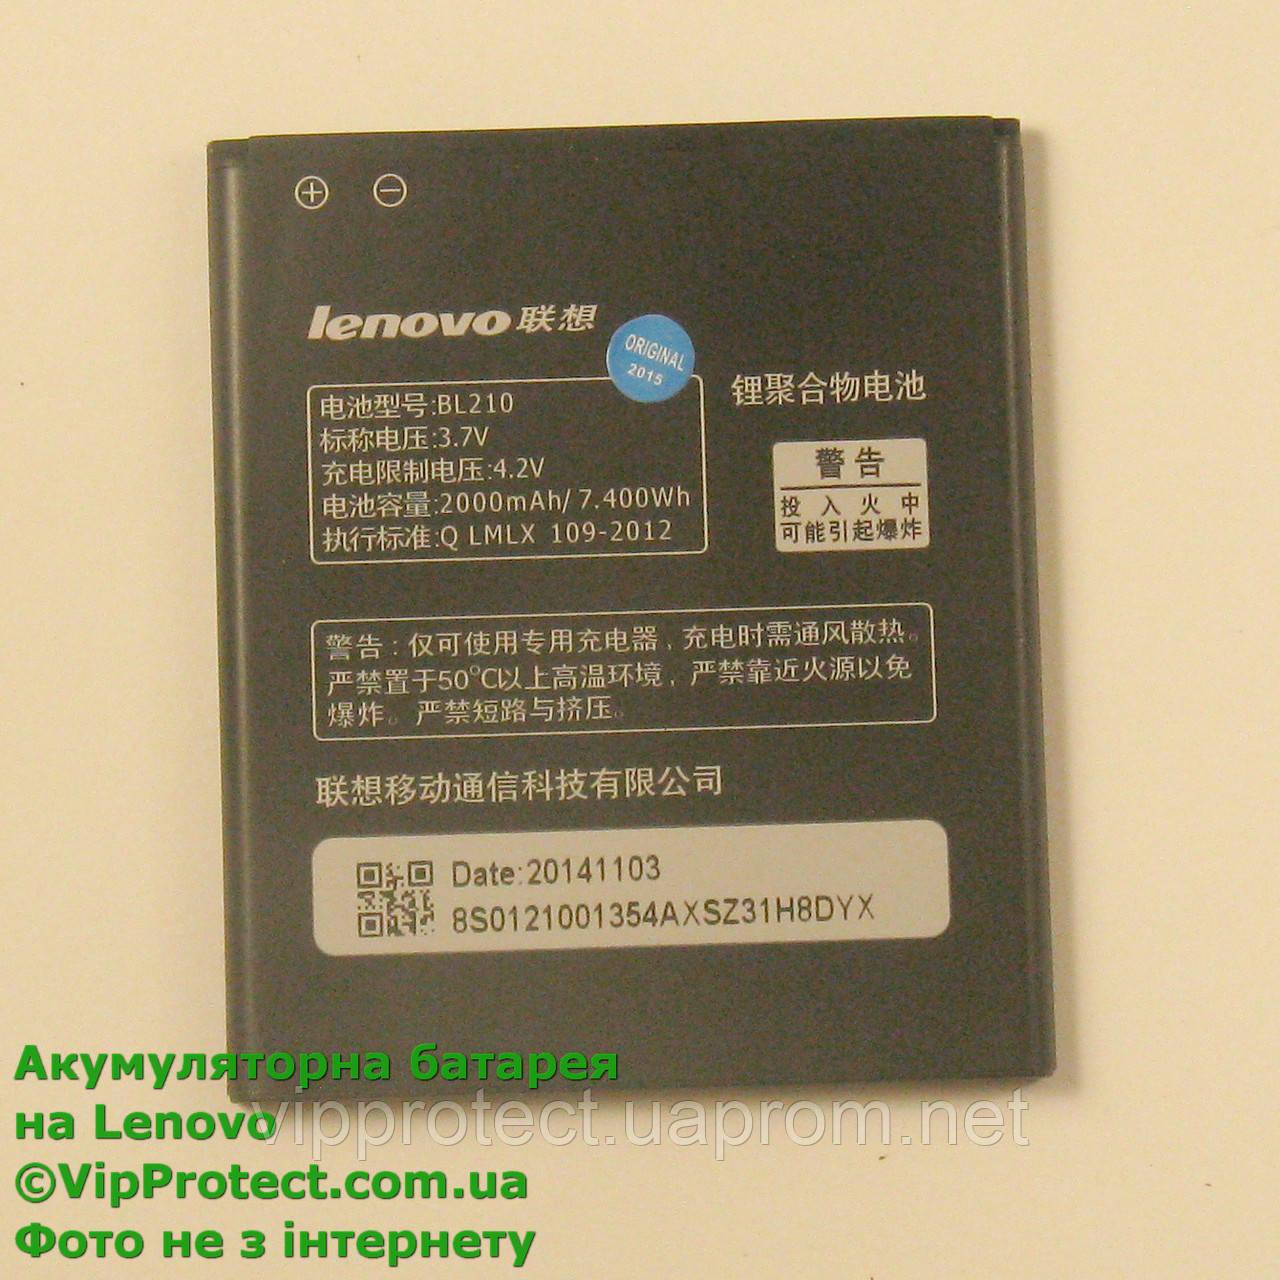 Lenovo S820e BL210 акумулятор 2000мА⋅год оригінальний